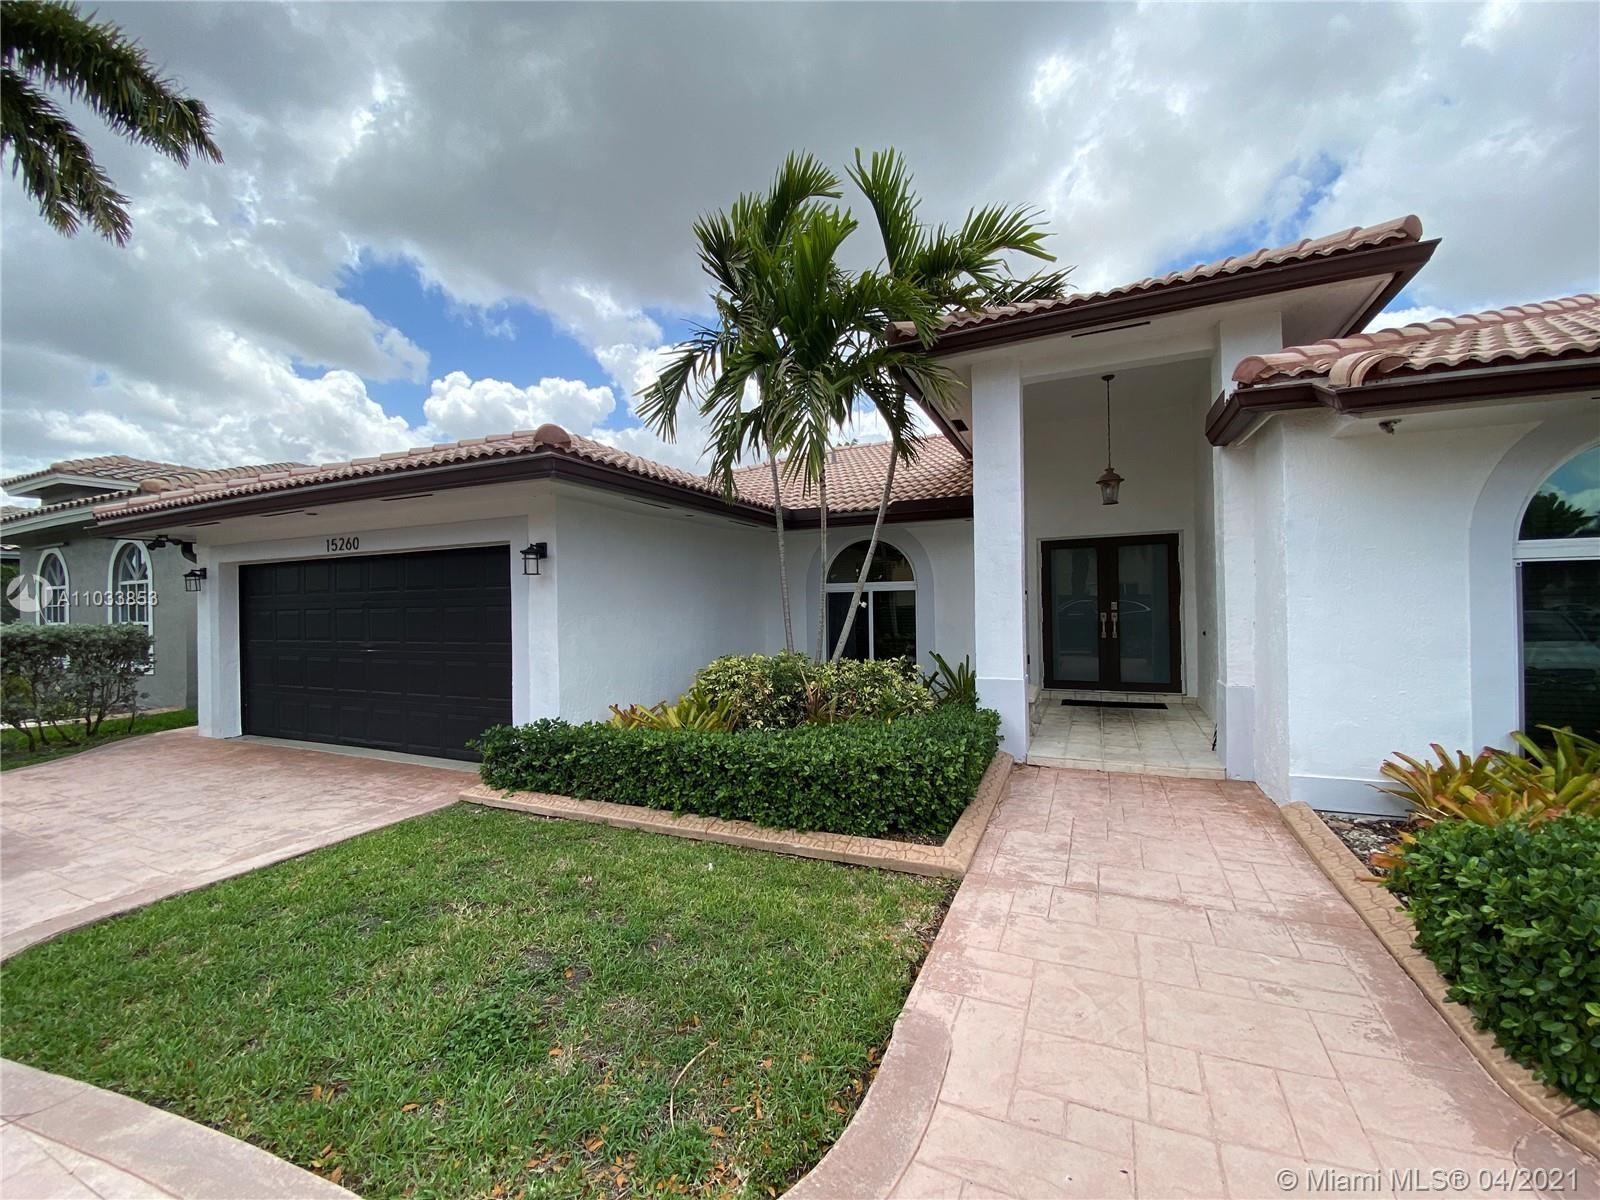 15260 SW 143rd St, Miami, FL 33196 - #: A11033853